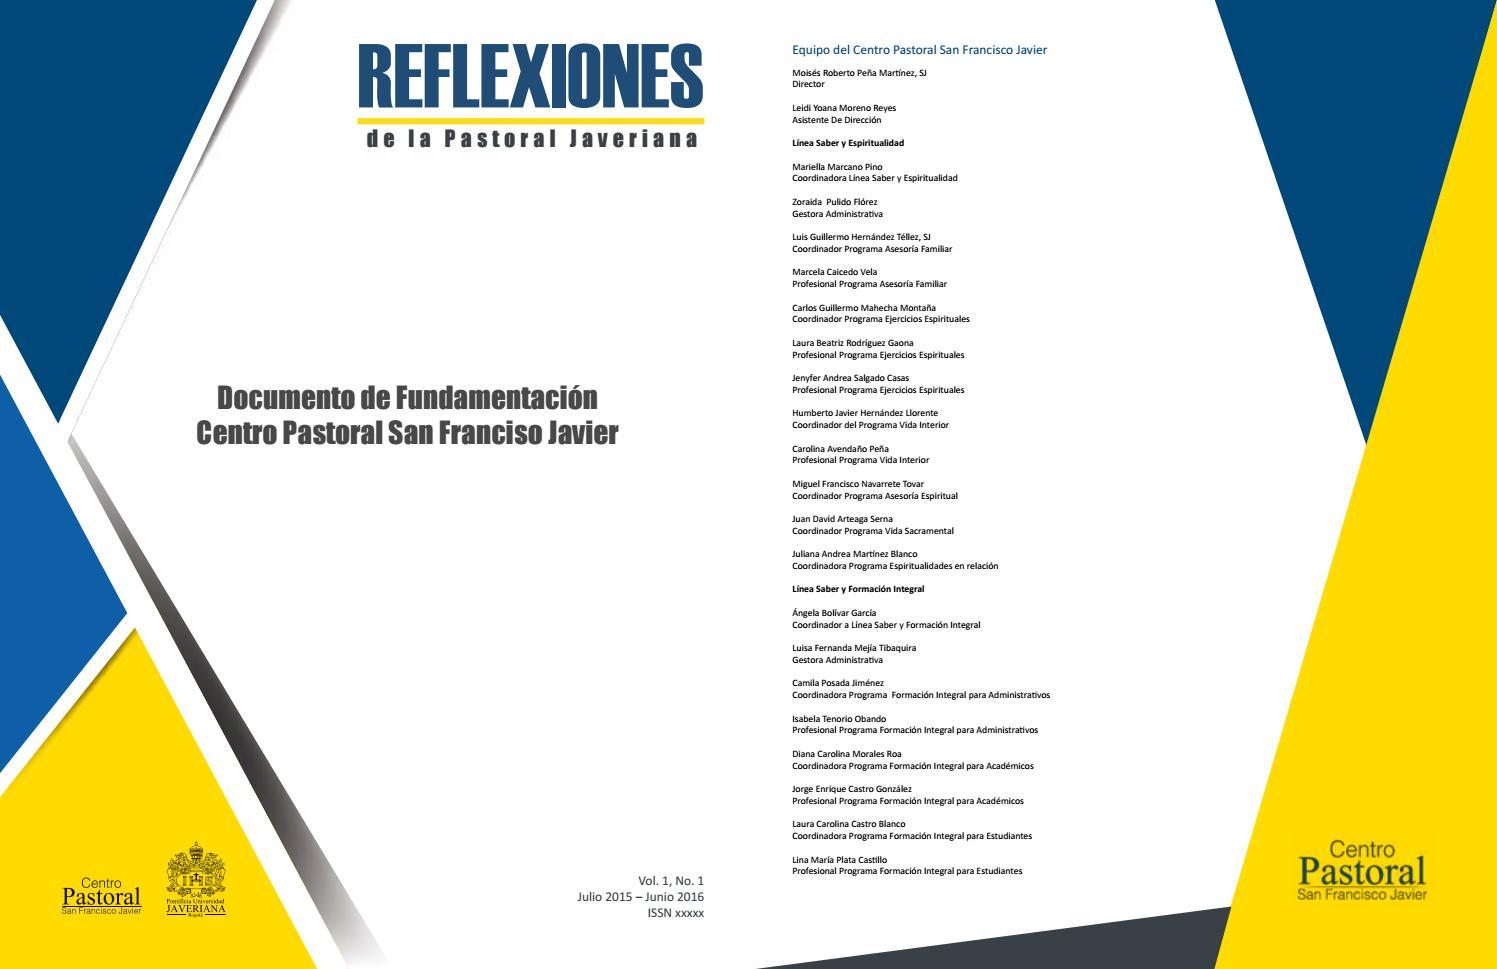 Documento De Fundamentación By Centro Pastoral San Francisco